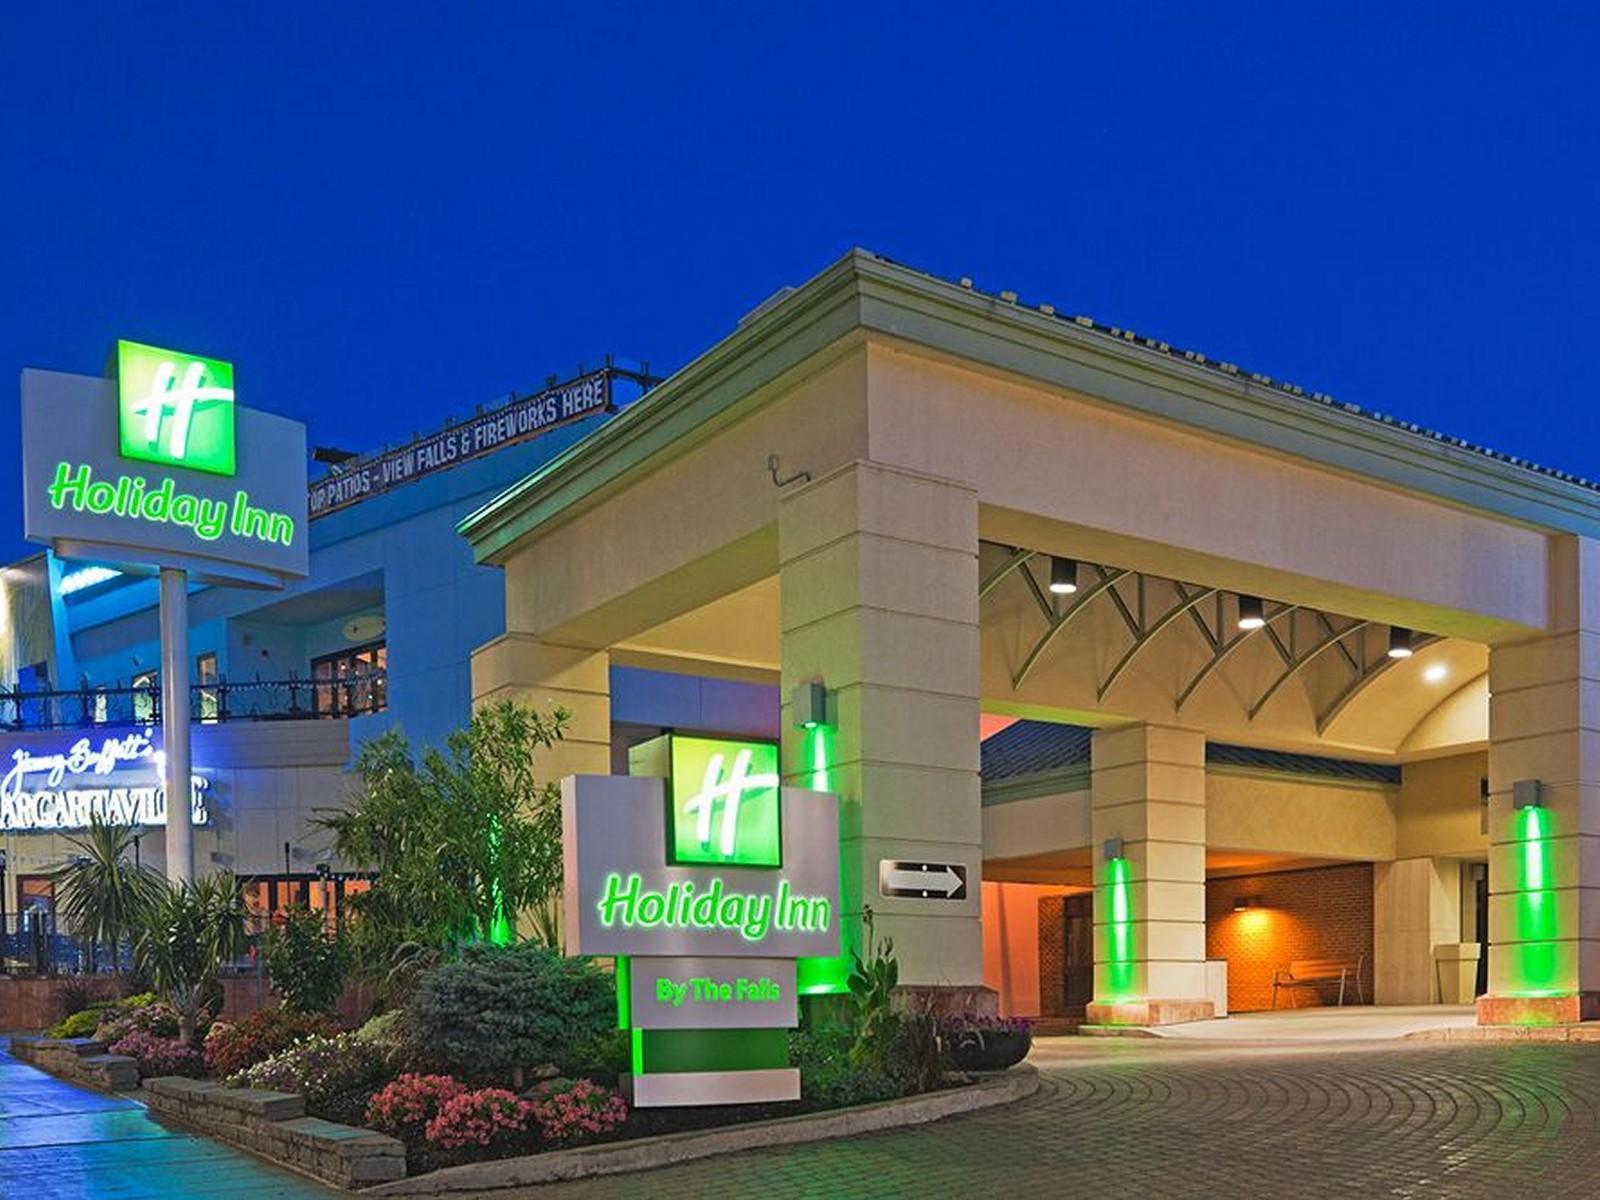 Holiday Inn Niagara Falls - By The Falls Hotel